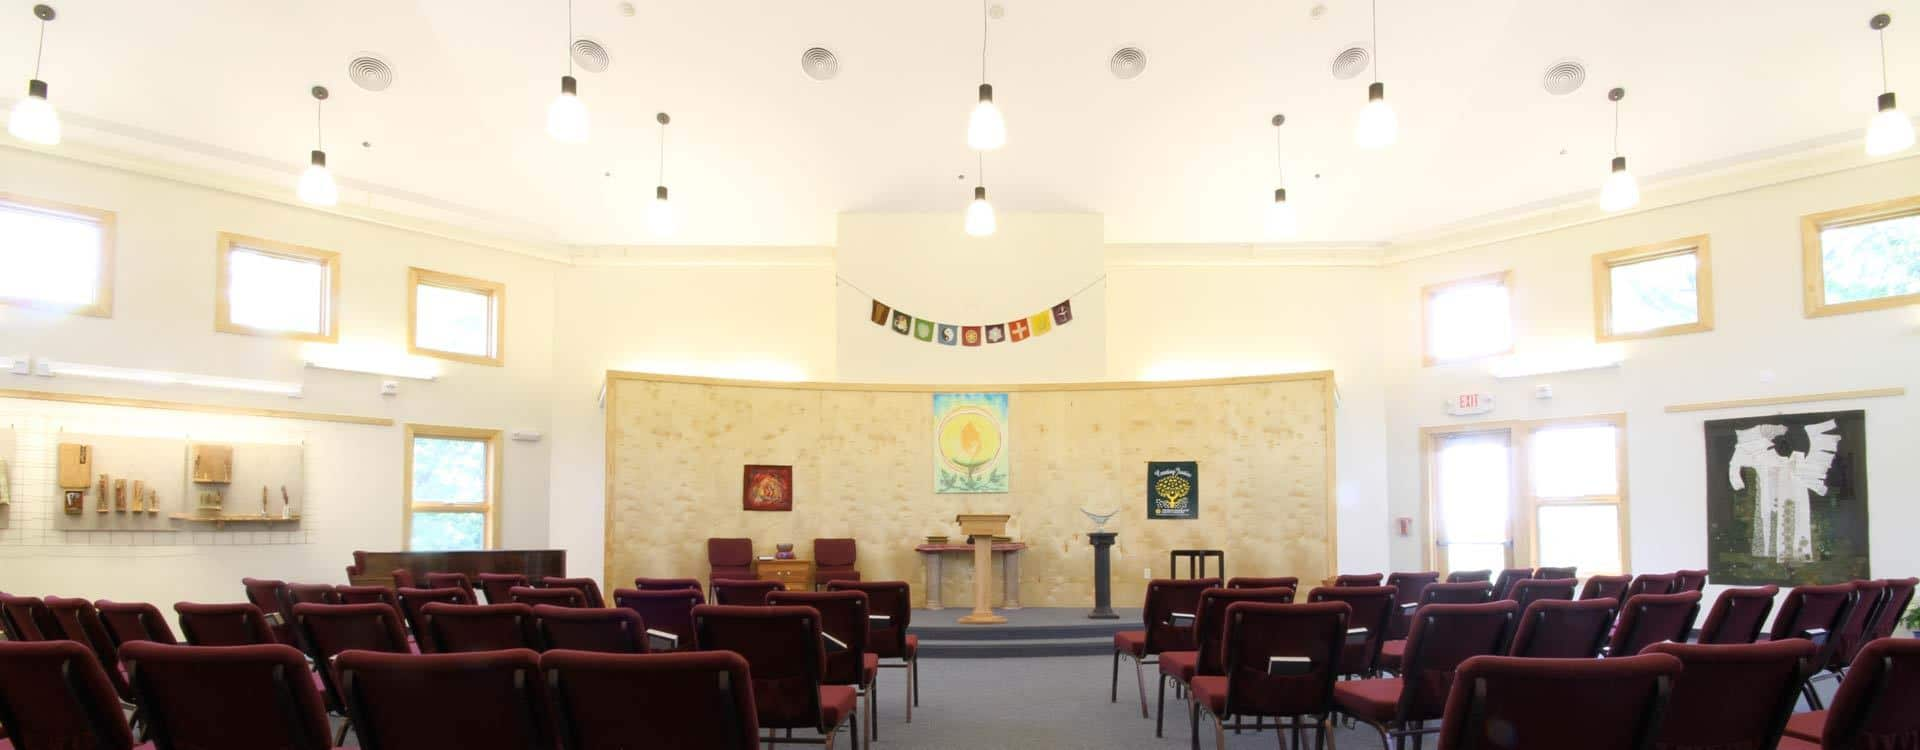 Unitarian Universalist Church Interior